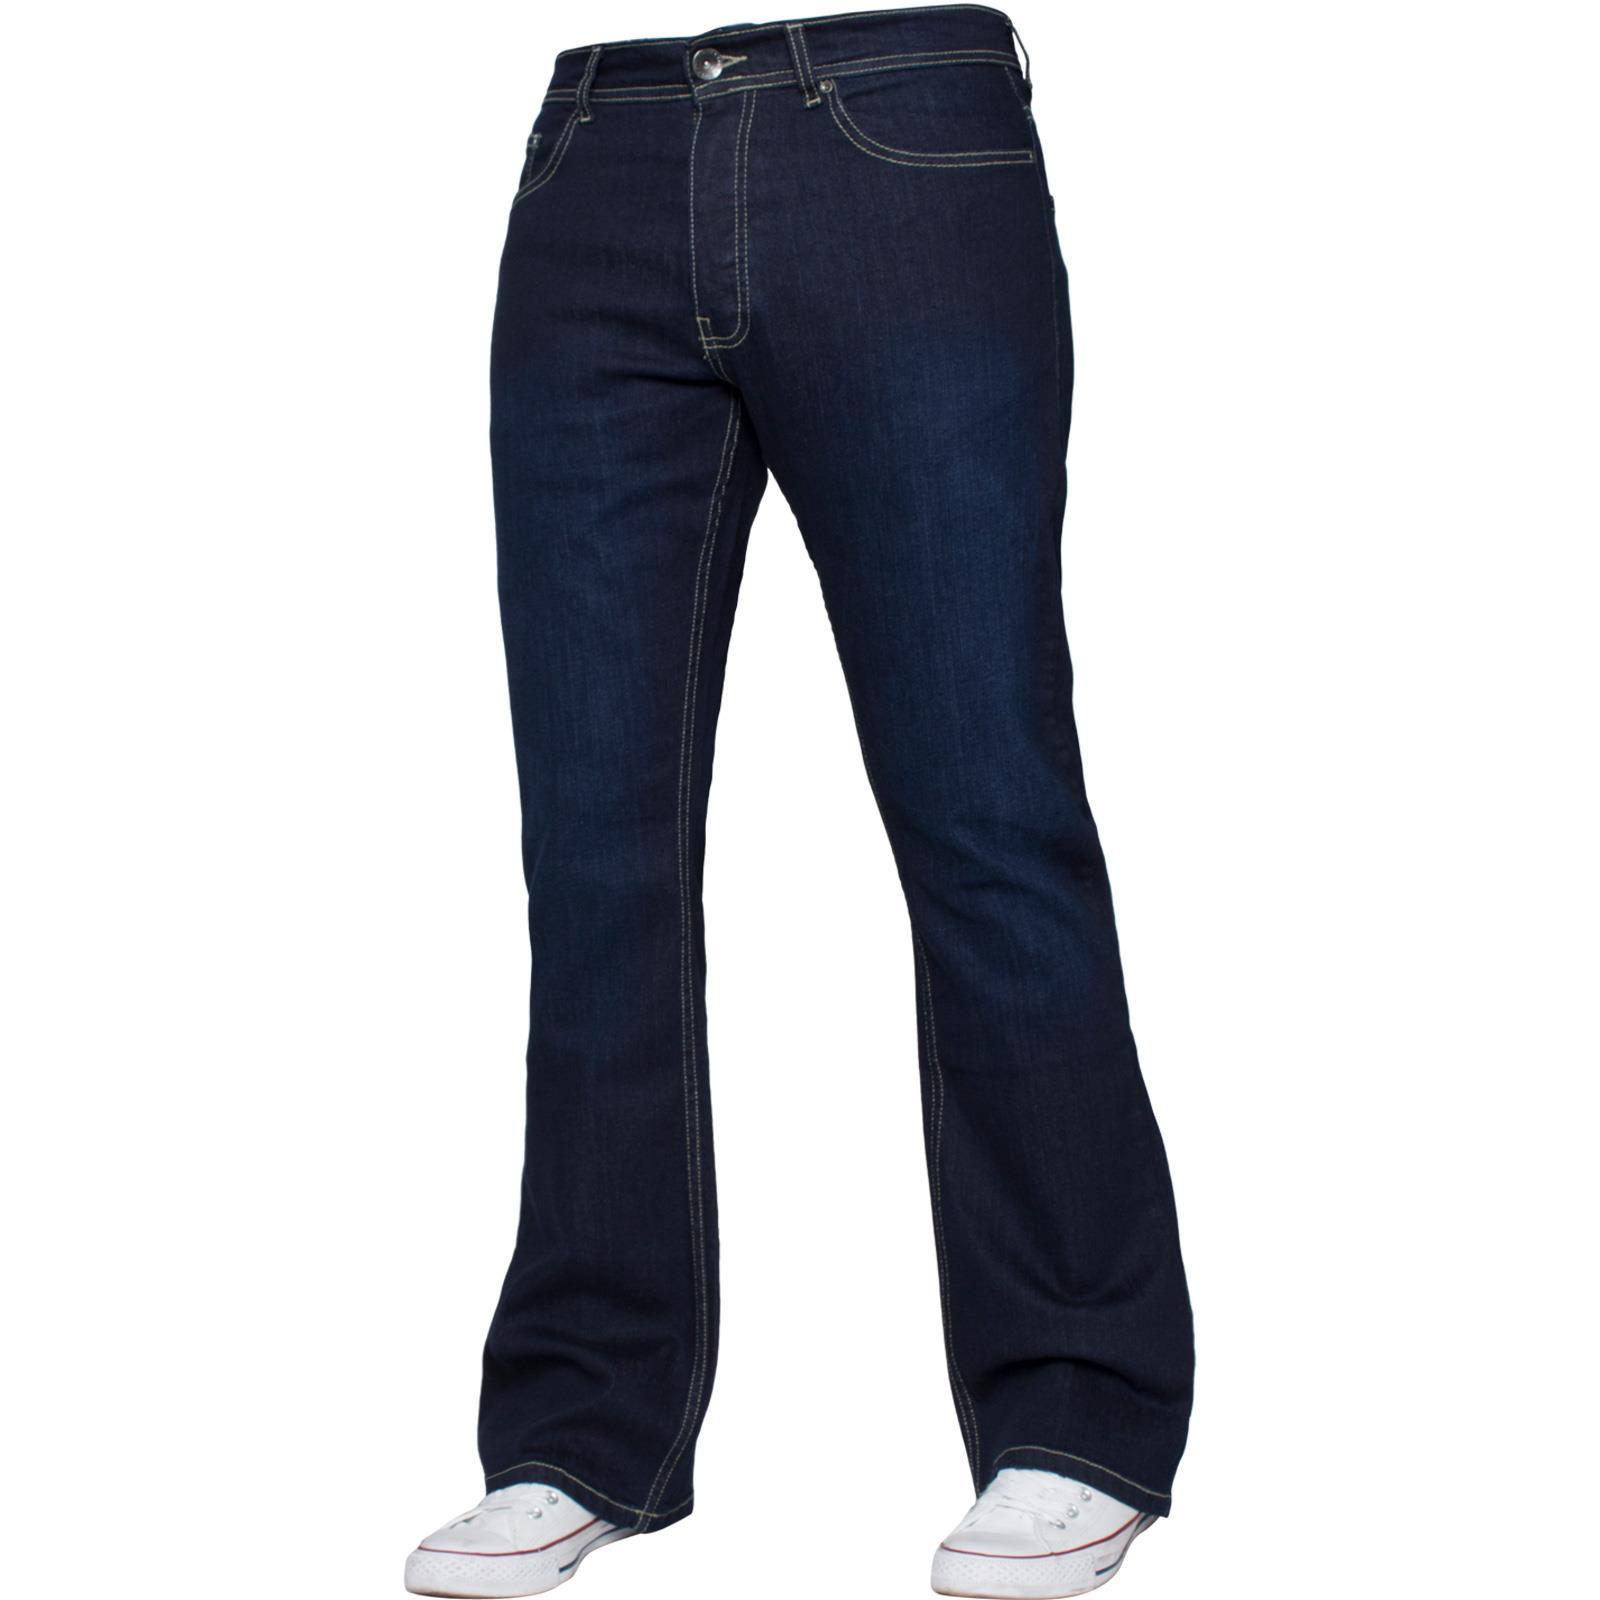 Para-Hombre-Recto-Bootcut-Stretch-Jeans-Pantalones-Regular-Fit-Grande-Alto-Todas-Cinturas miniatura 47